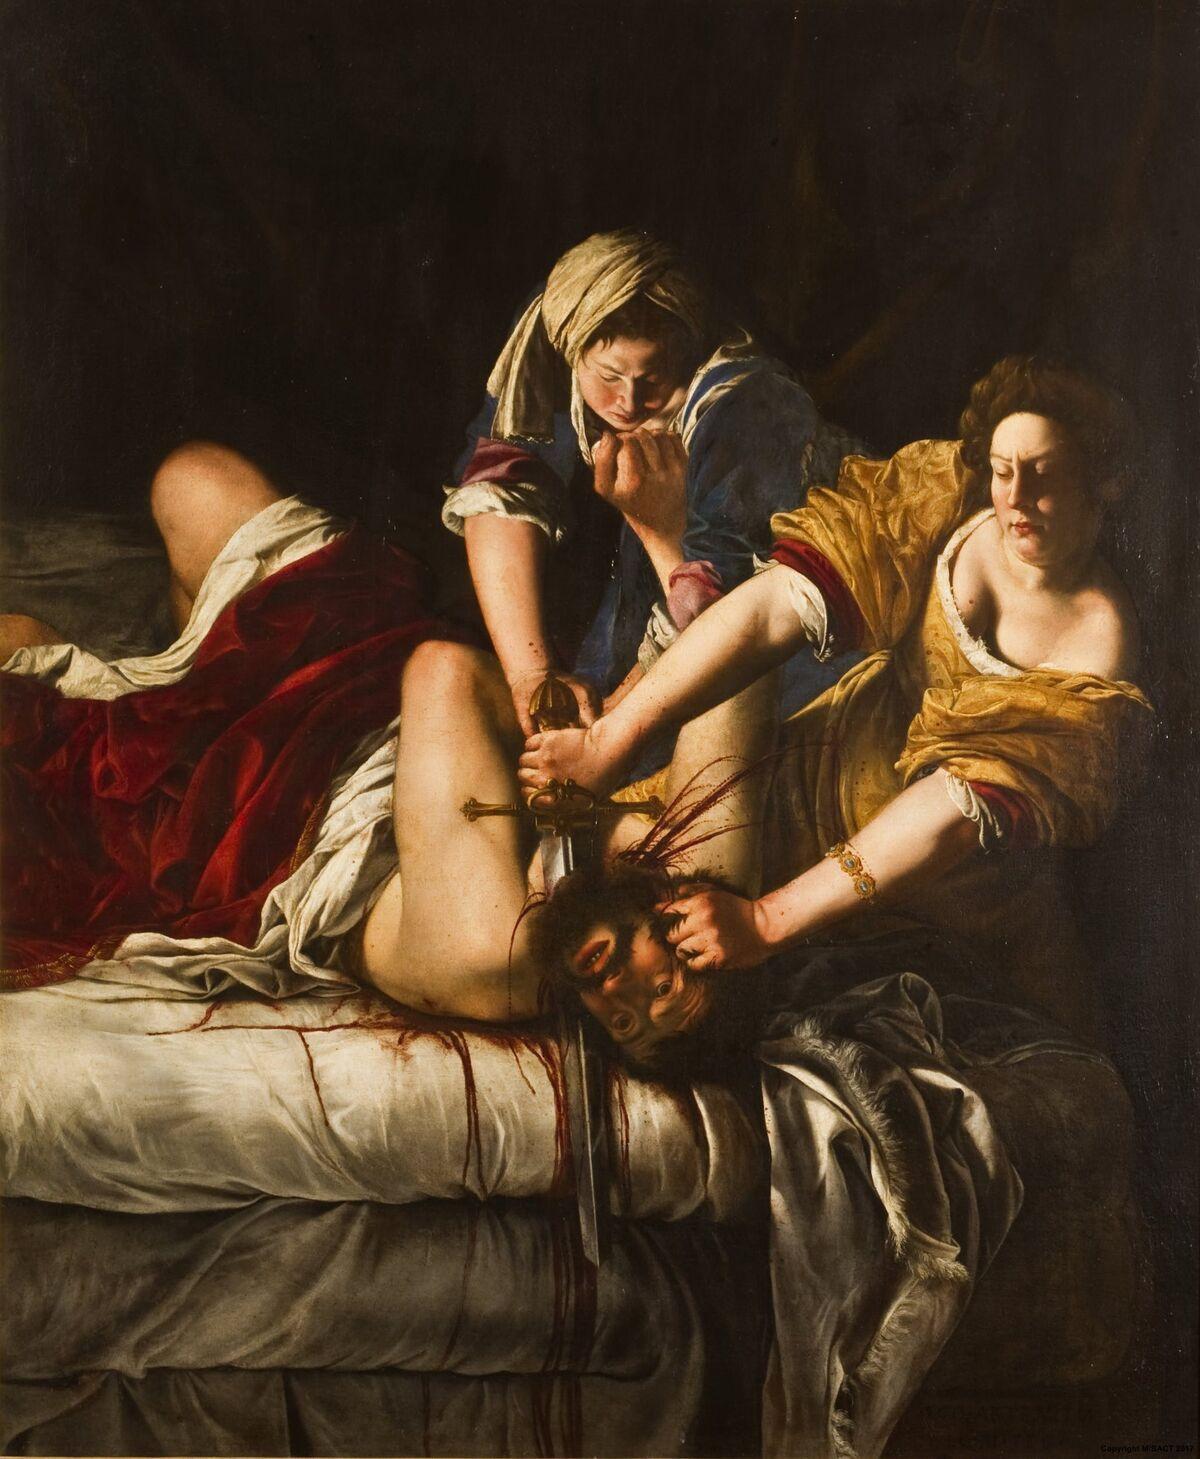 Artemisia Gentileschi, Judith Beheading Holofernes, c. 1620. Courtesy of The Uffizi.